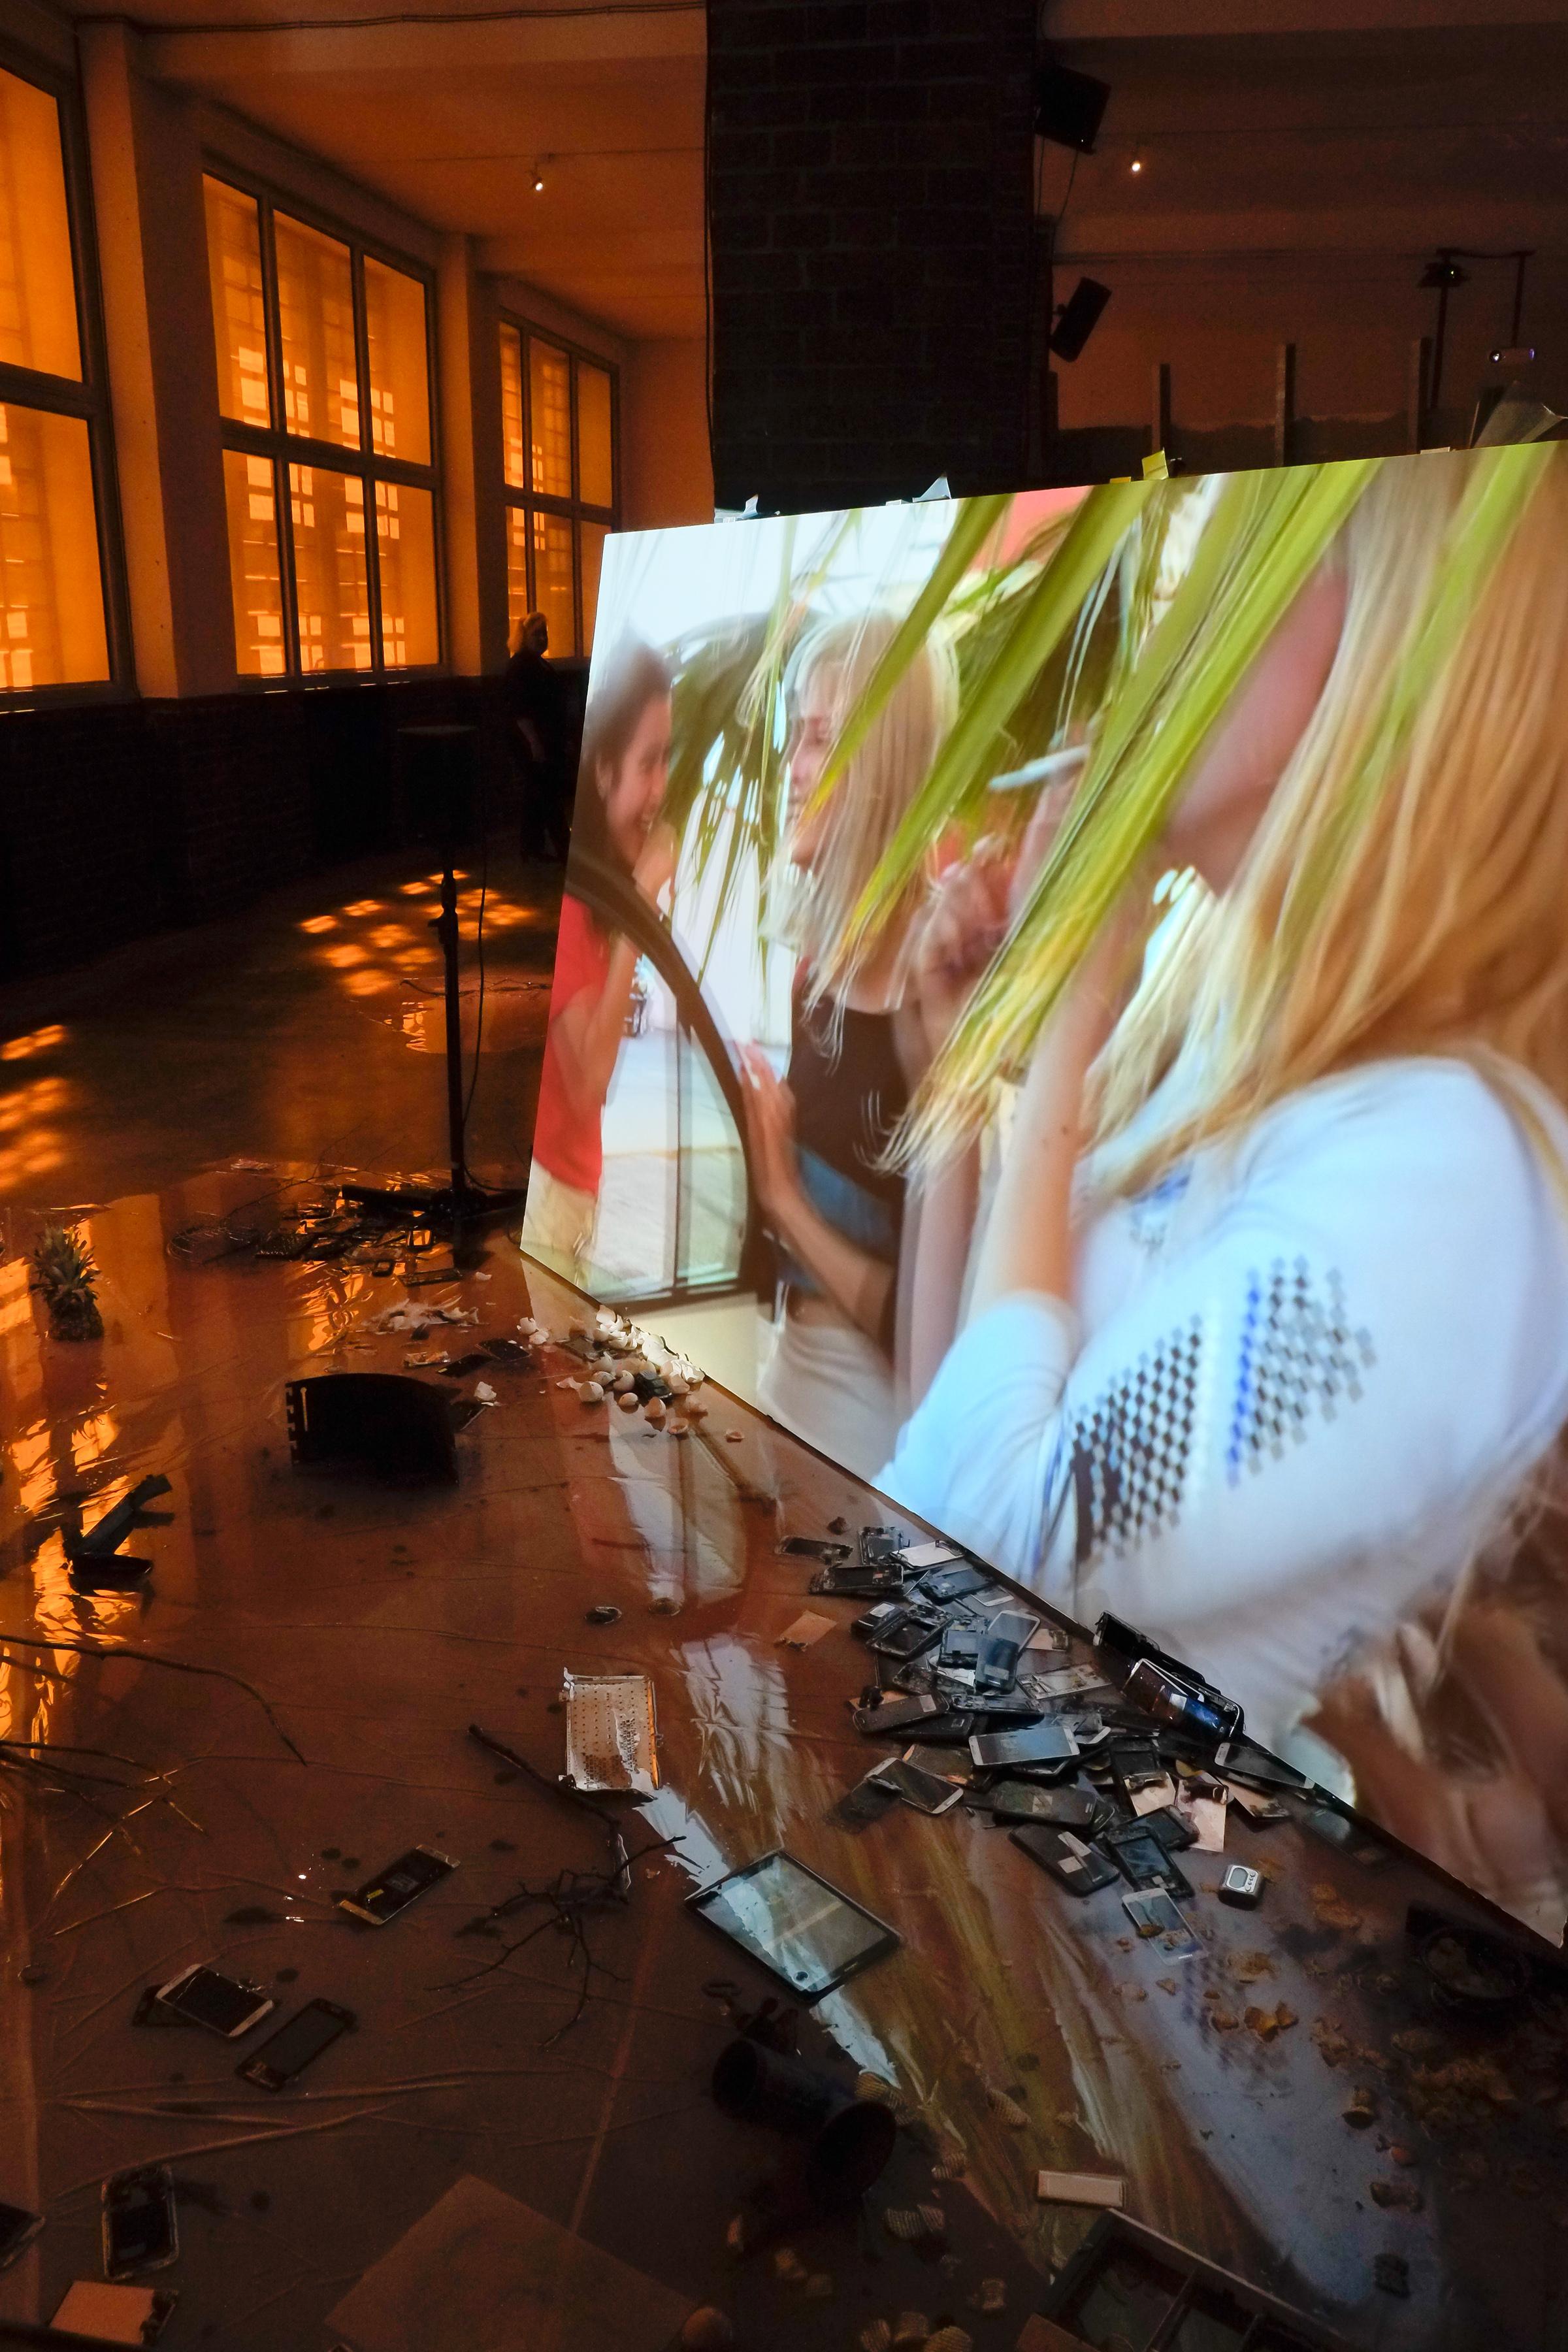 Laure Prouvost, 2016. Installationsansicht/installation view, © Laure Prouvost, Courtesy of the Artist, Foto/photo: Axel Schneider